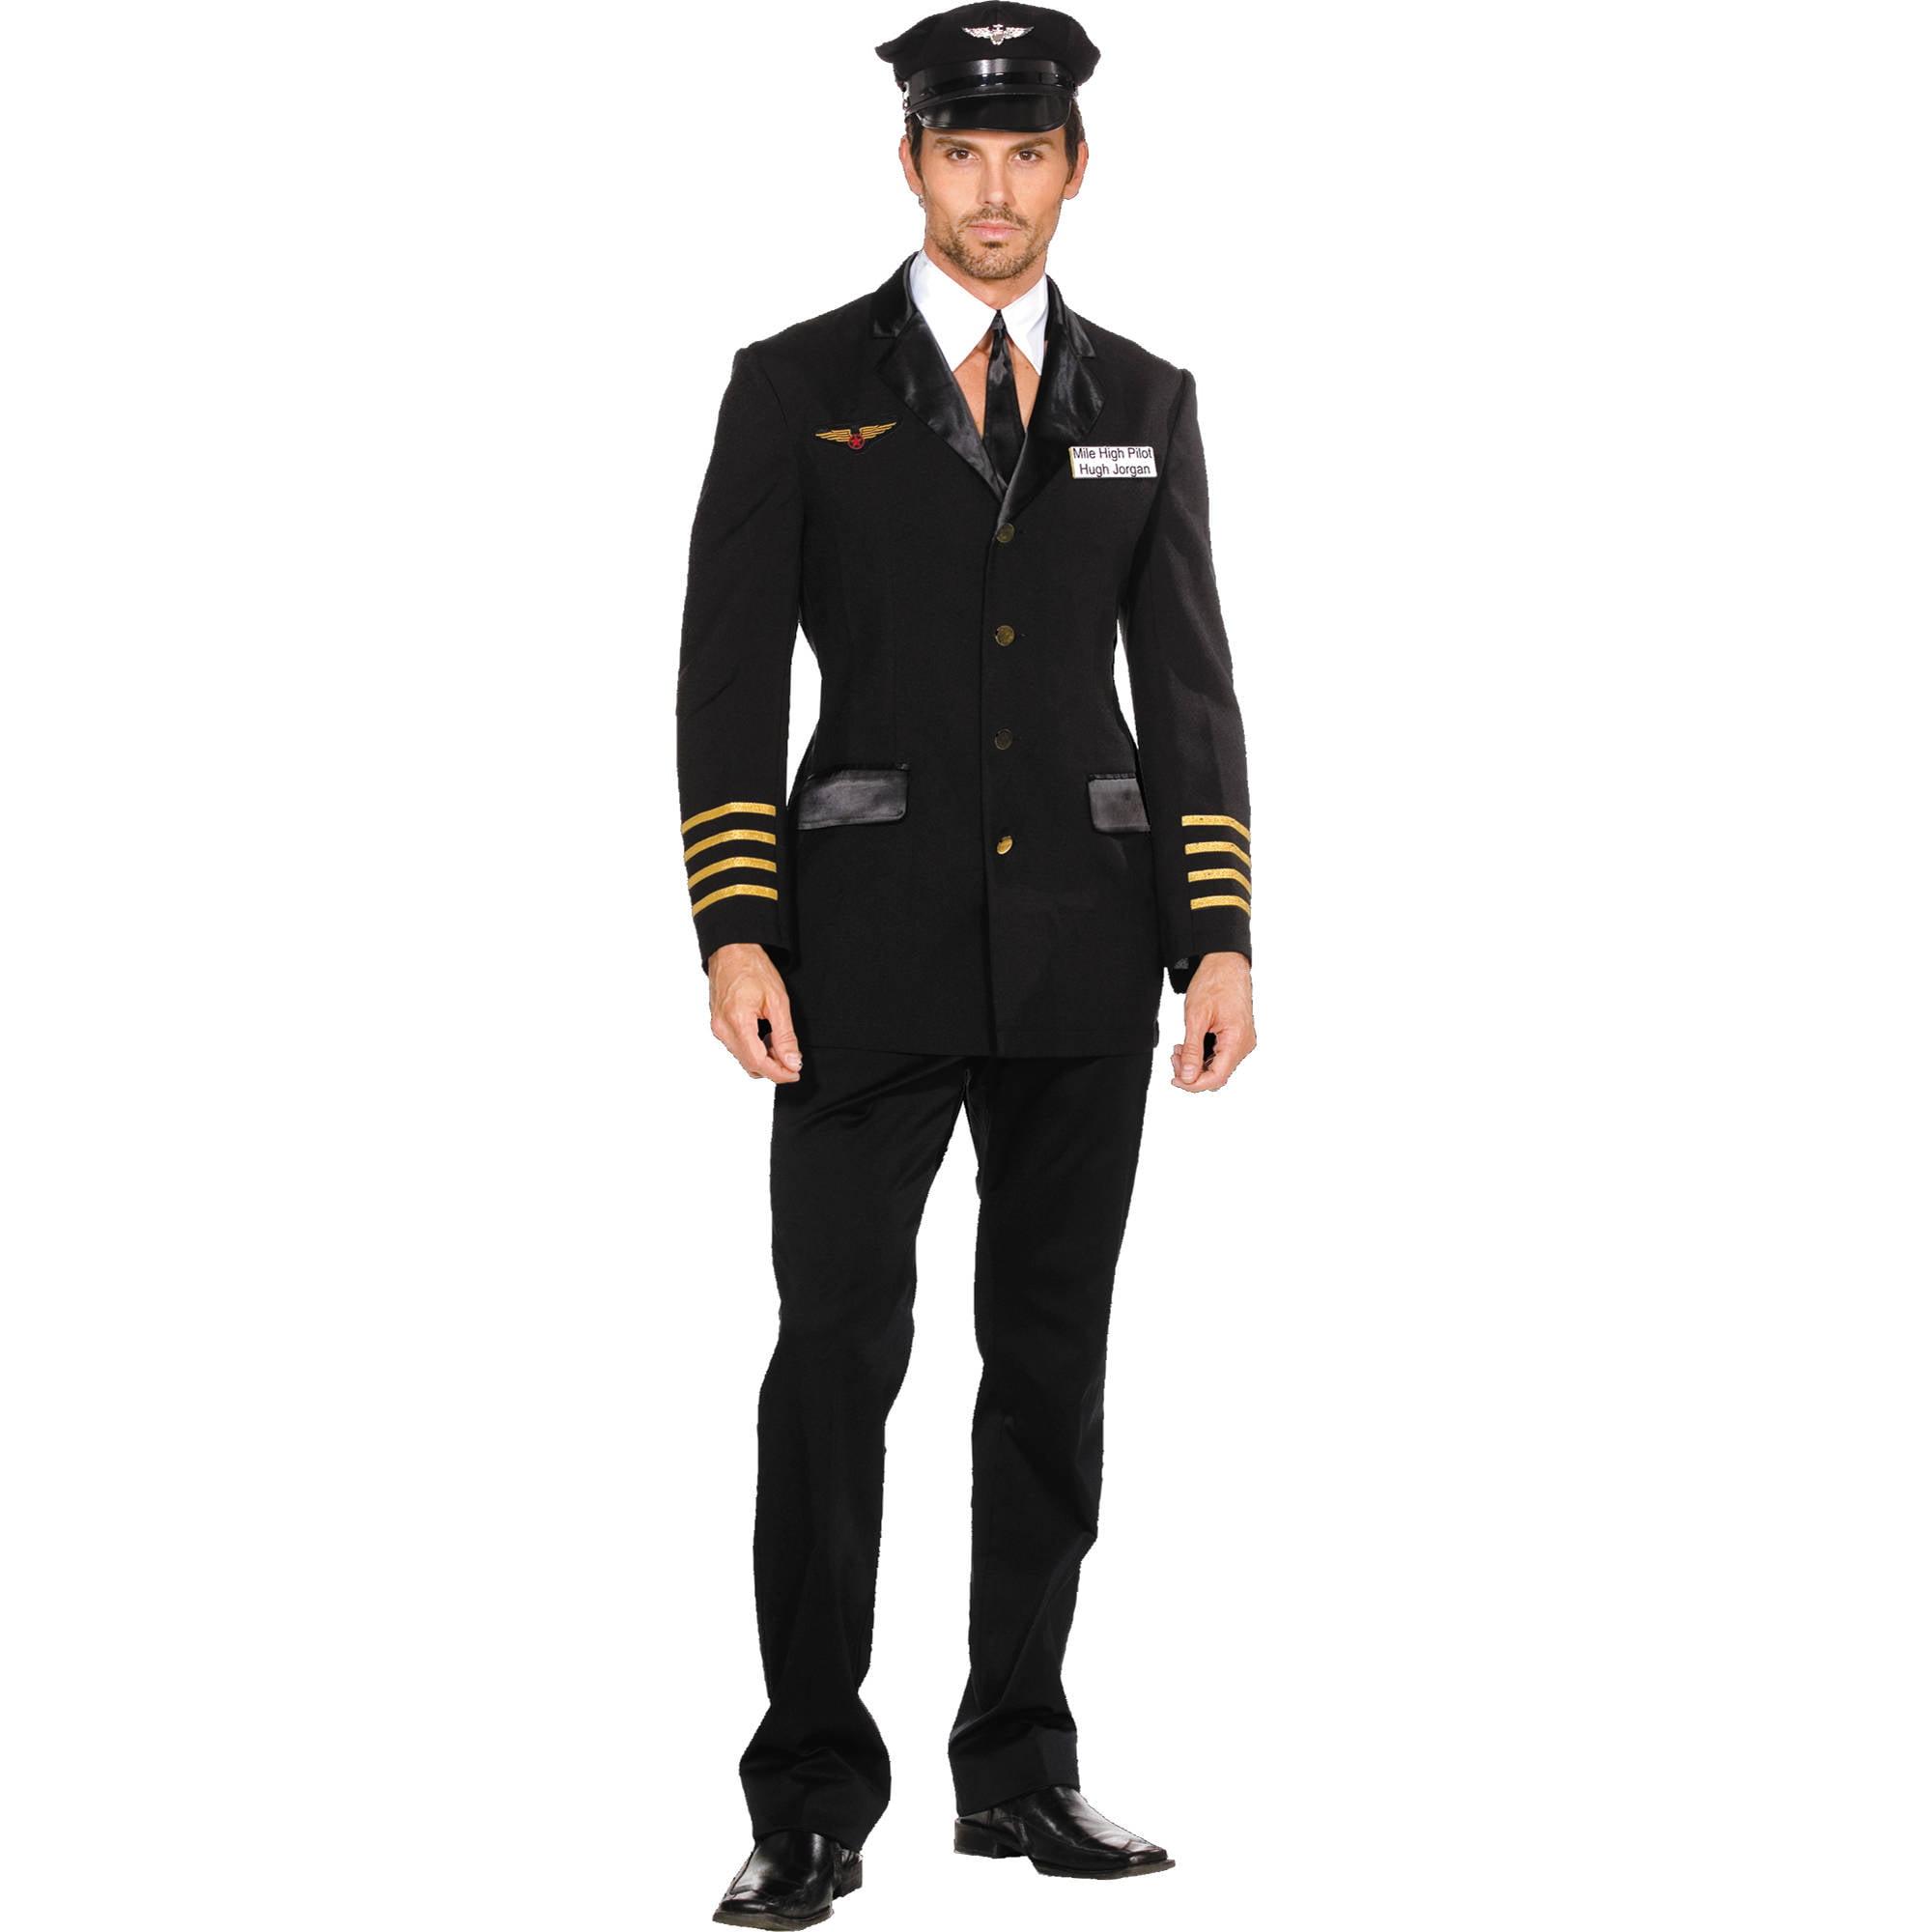 Pilot Hugh Jorgan Men's Adult Halloween Costume